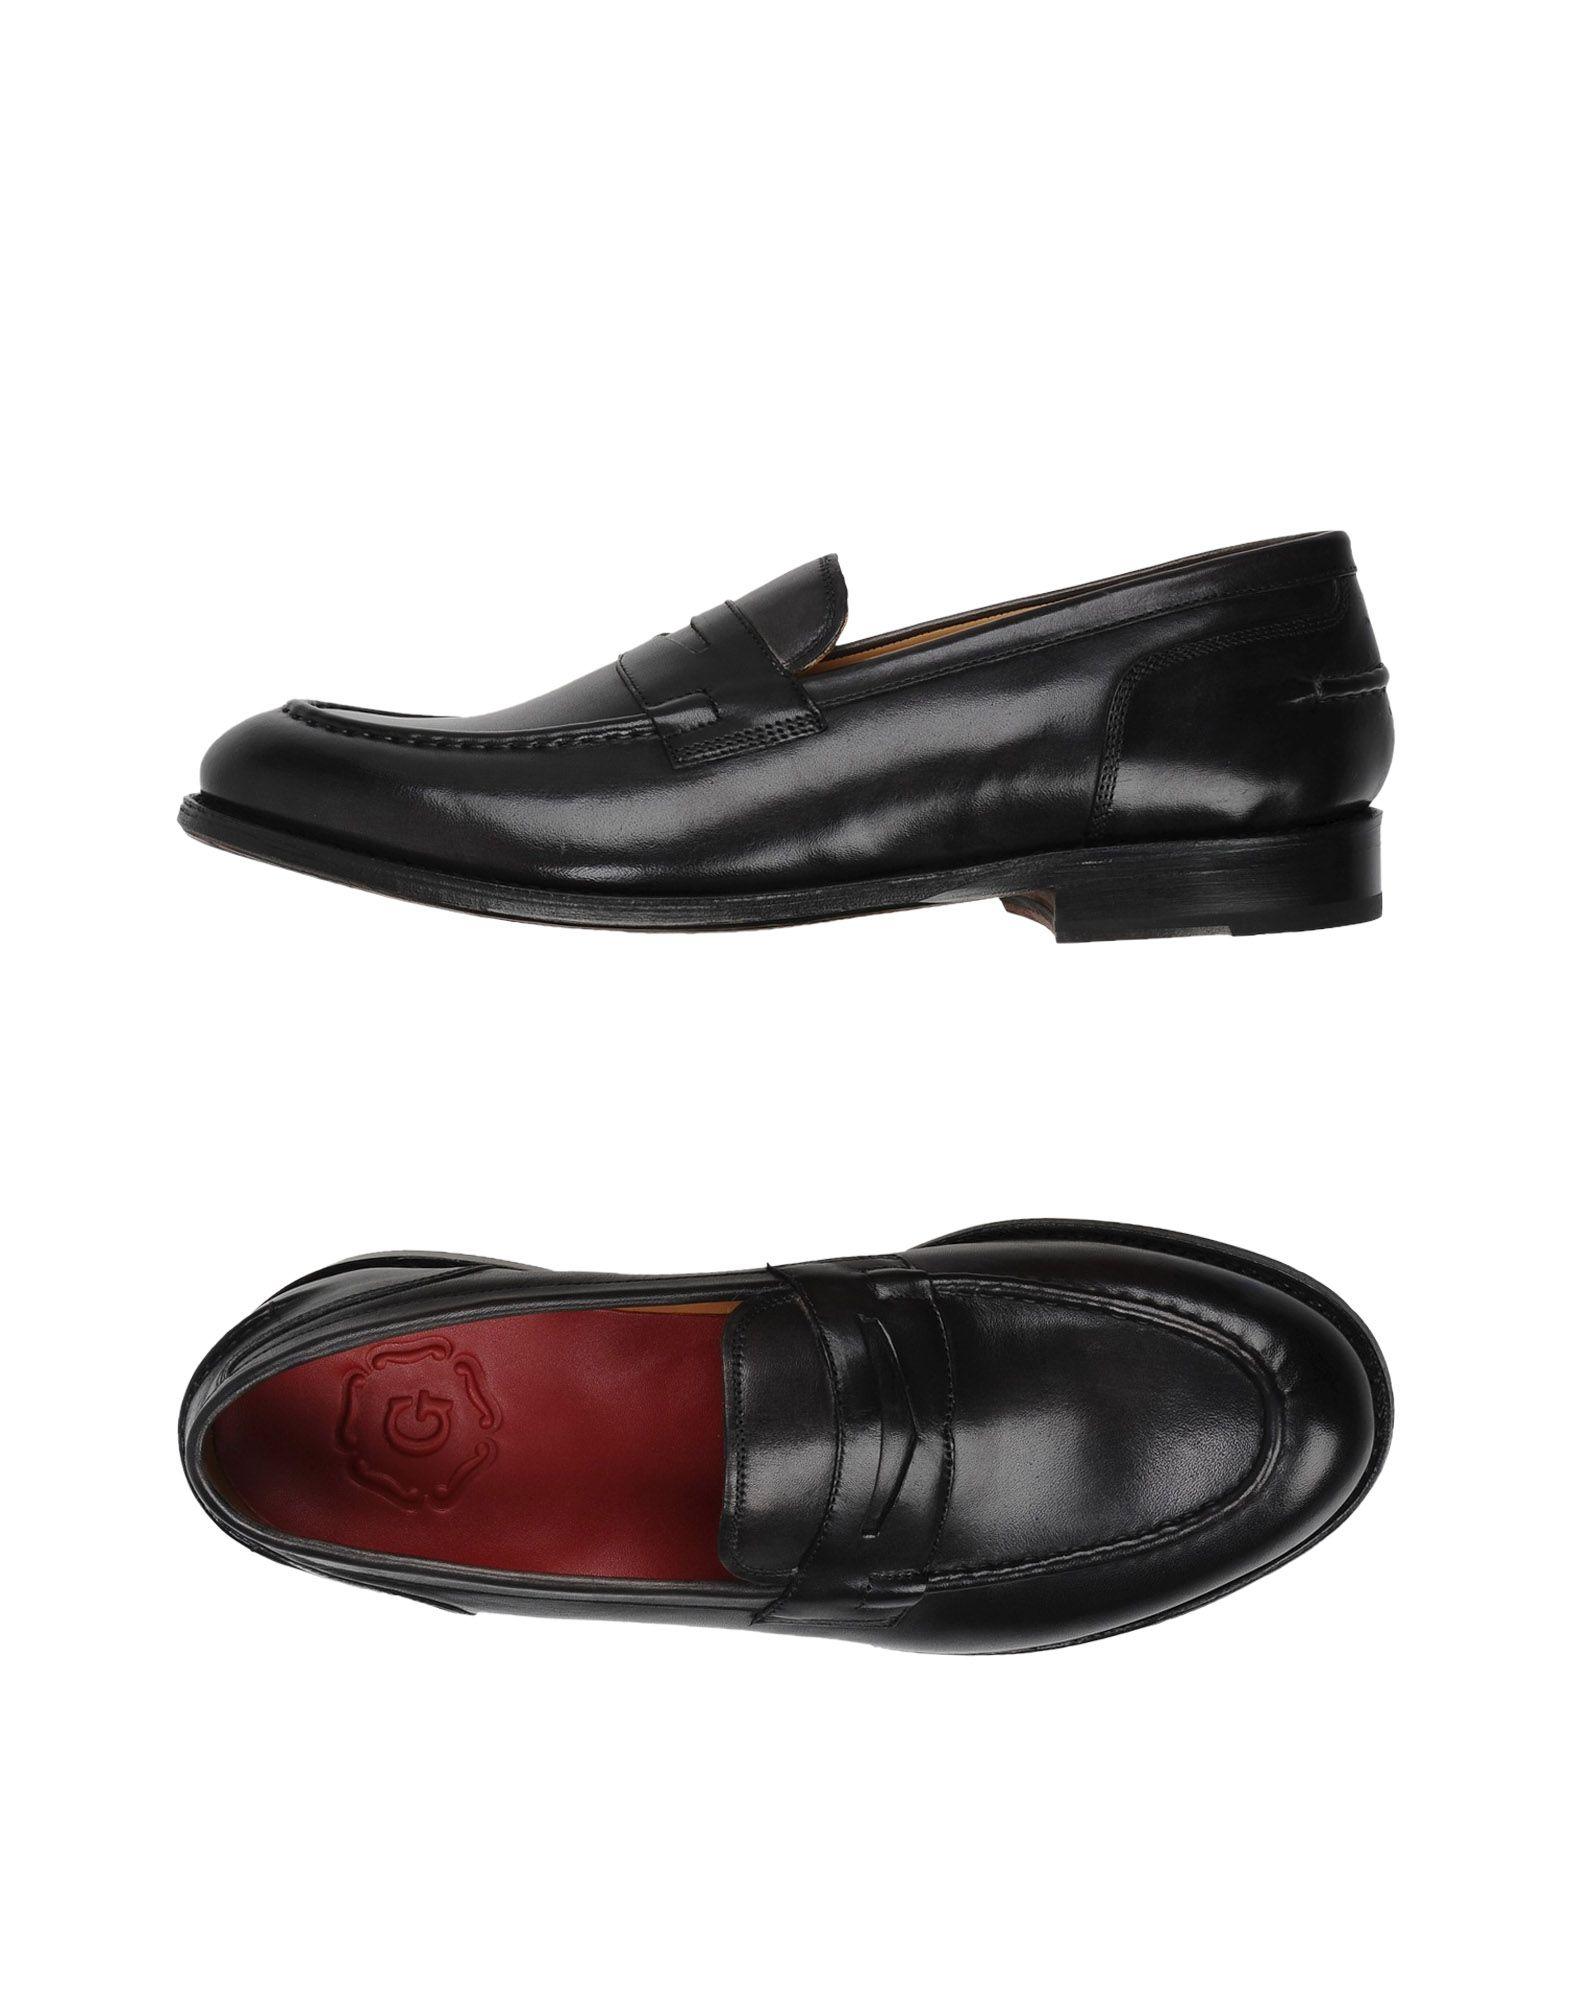 Mocassins Grenson Maxwell Dk Gry Handpainted Loafer Lesi E - Homme - Mocassins Grenson sur